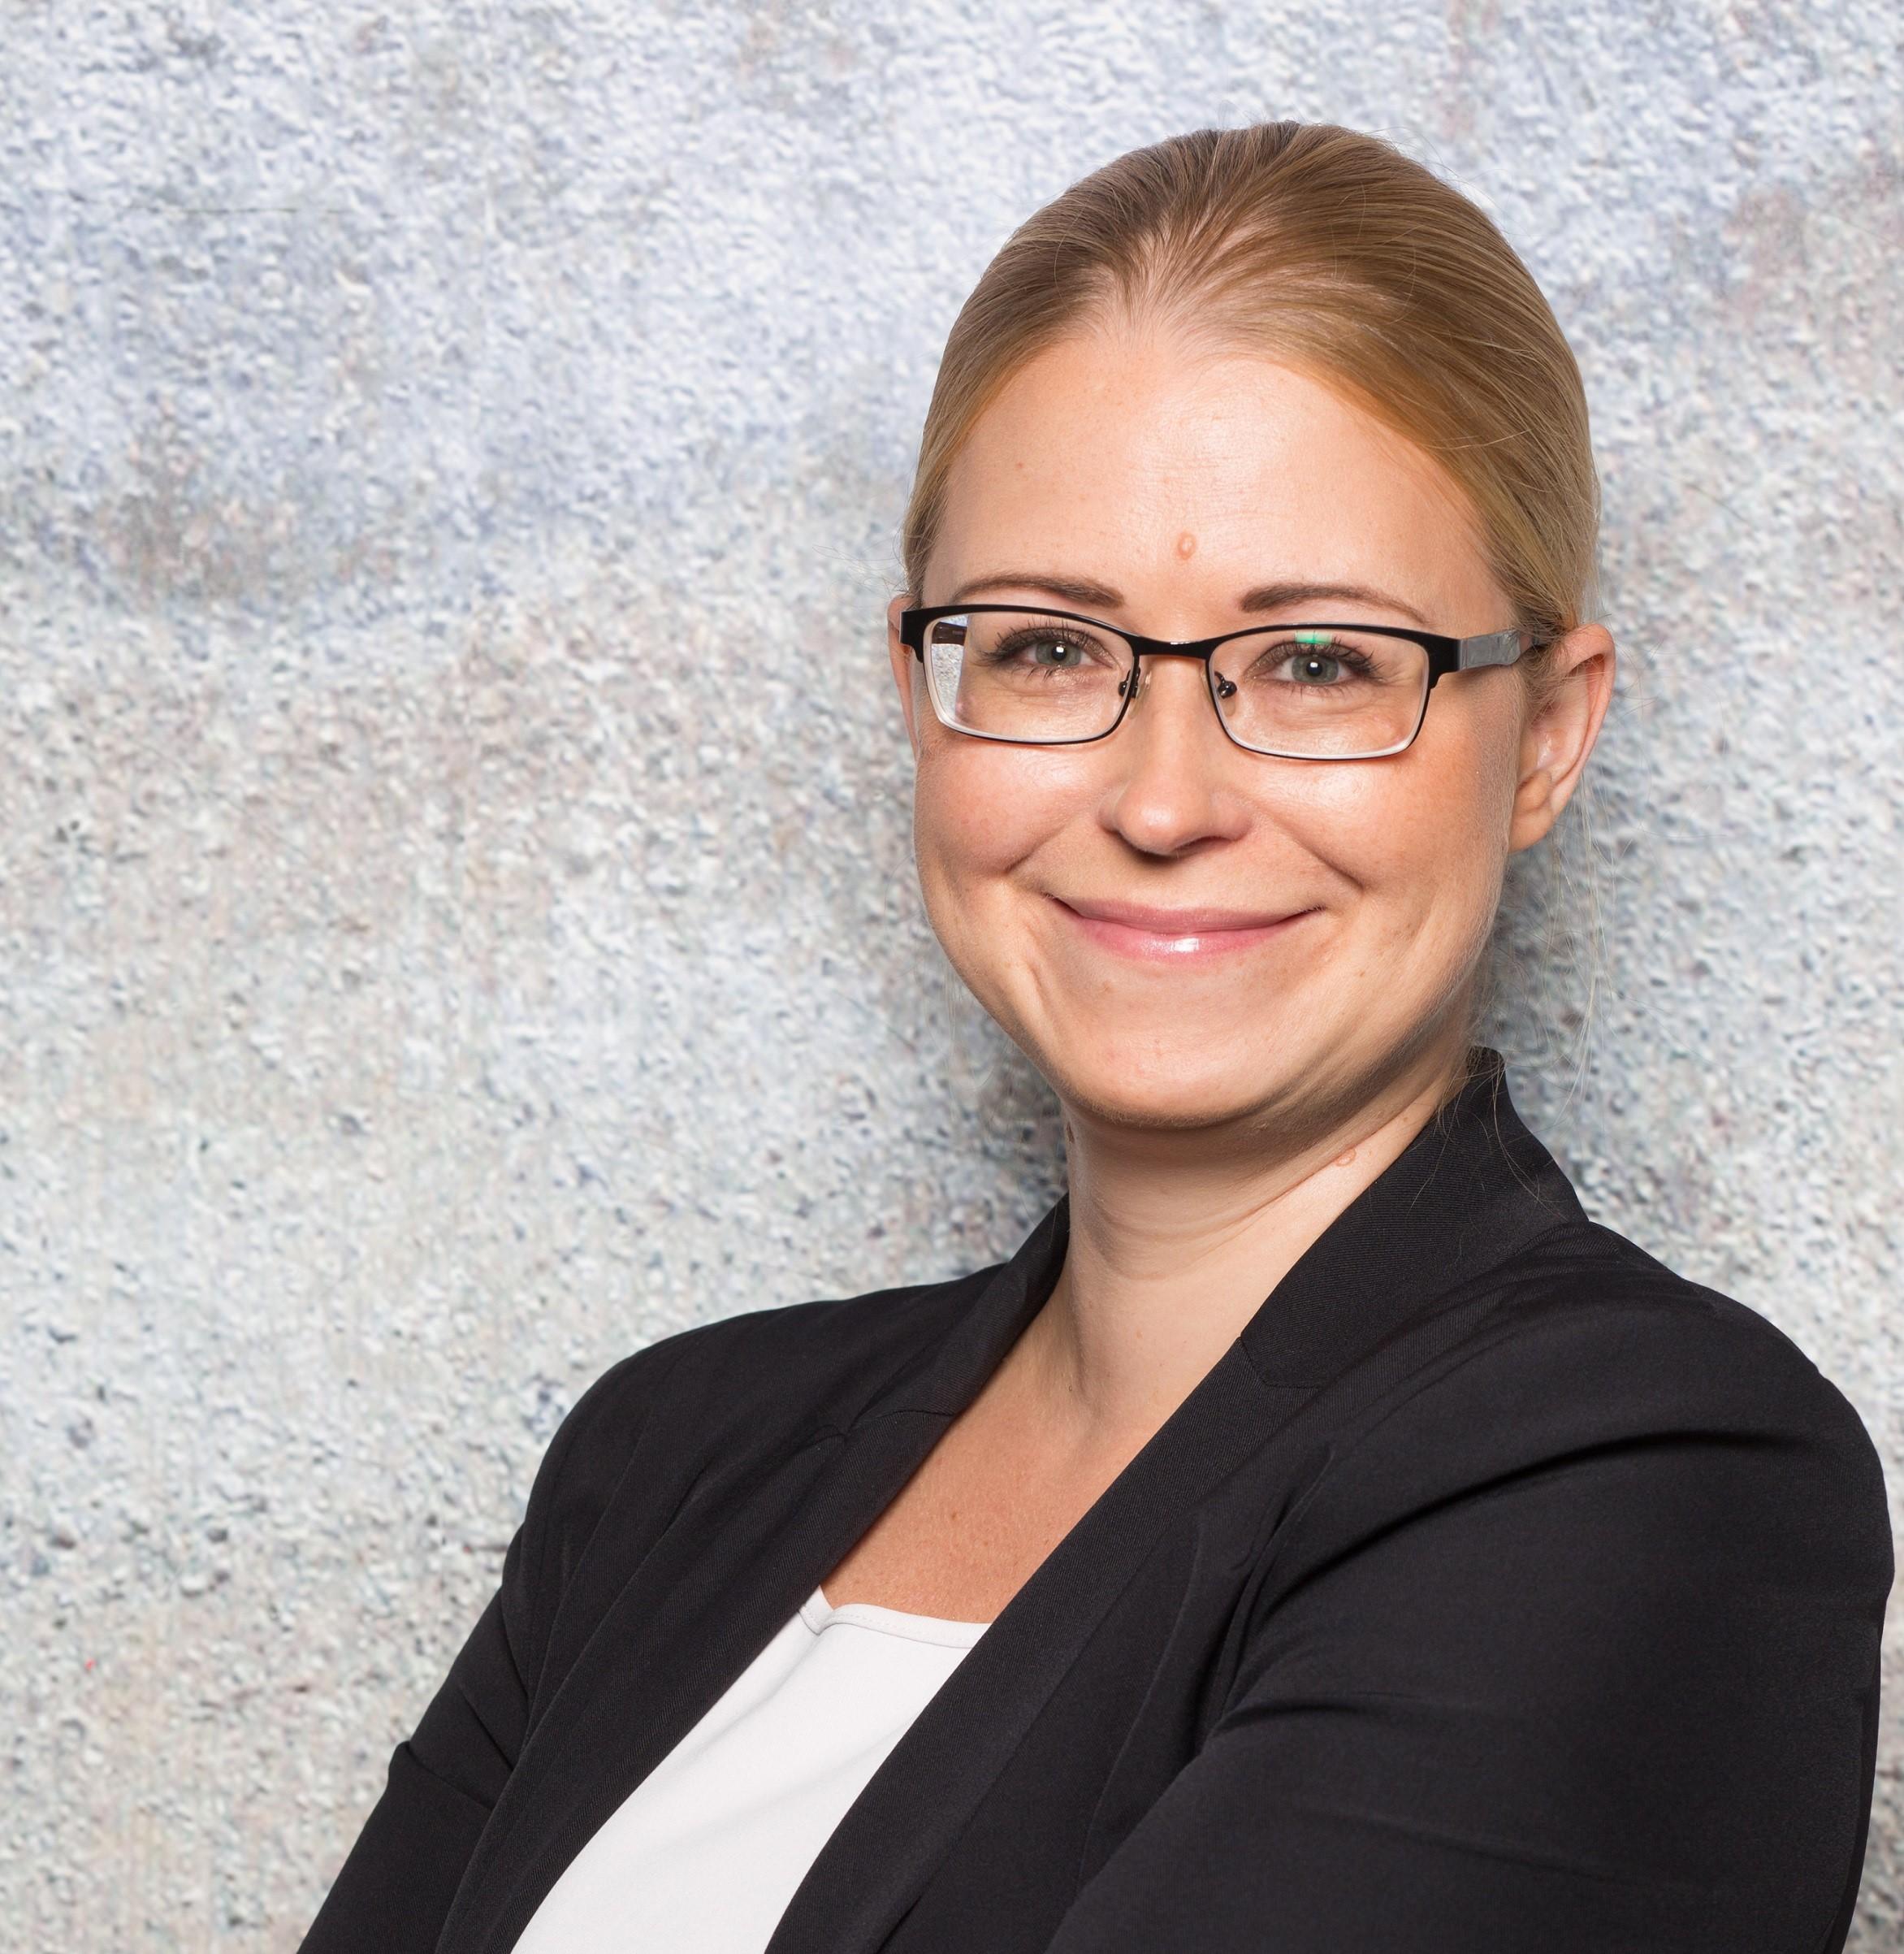 Mag.a Petra Grell-Kunzinger